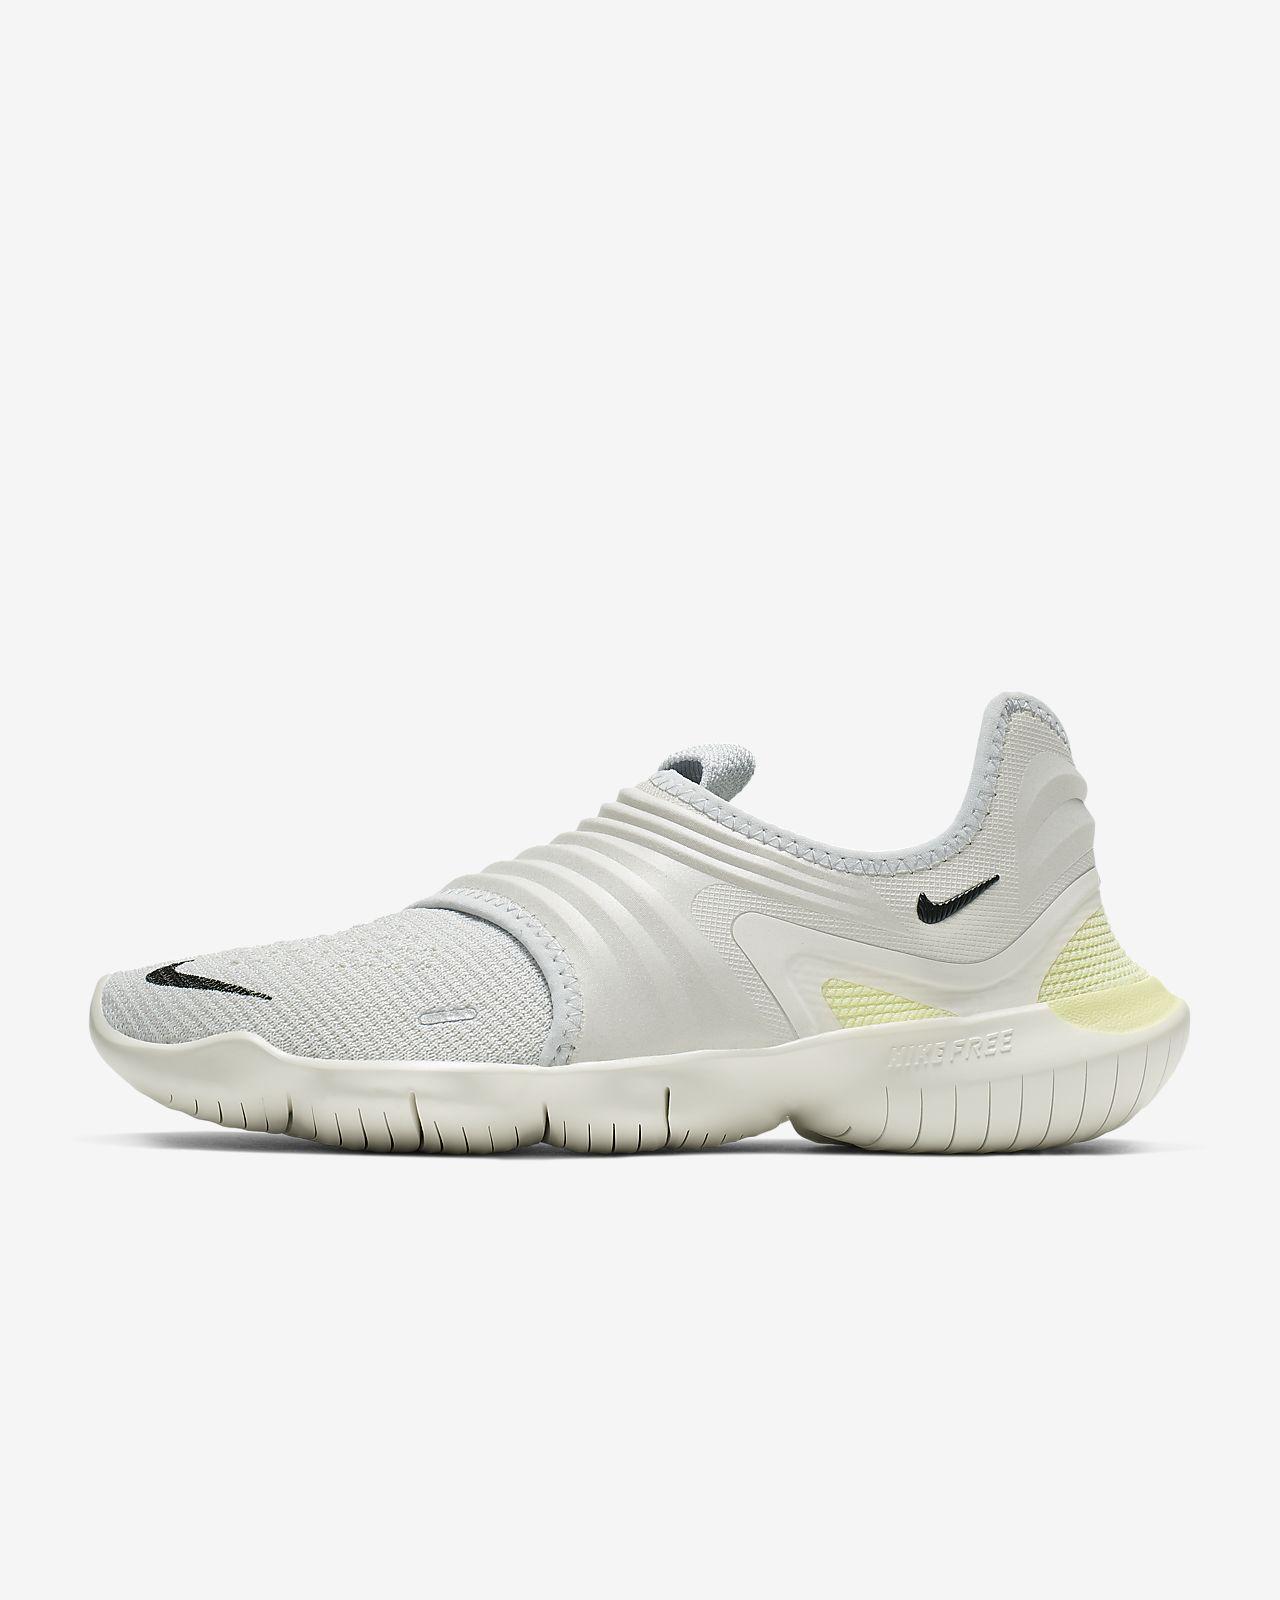 Rn De 0 Nike 3 Running Zapatillas Mujer Flyknit Free 8nwk0XPO